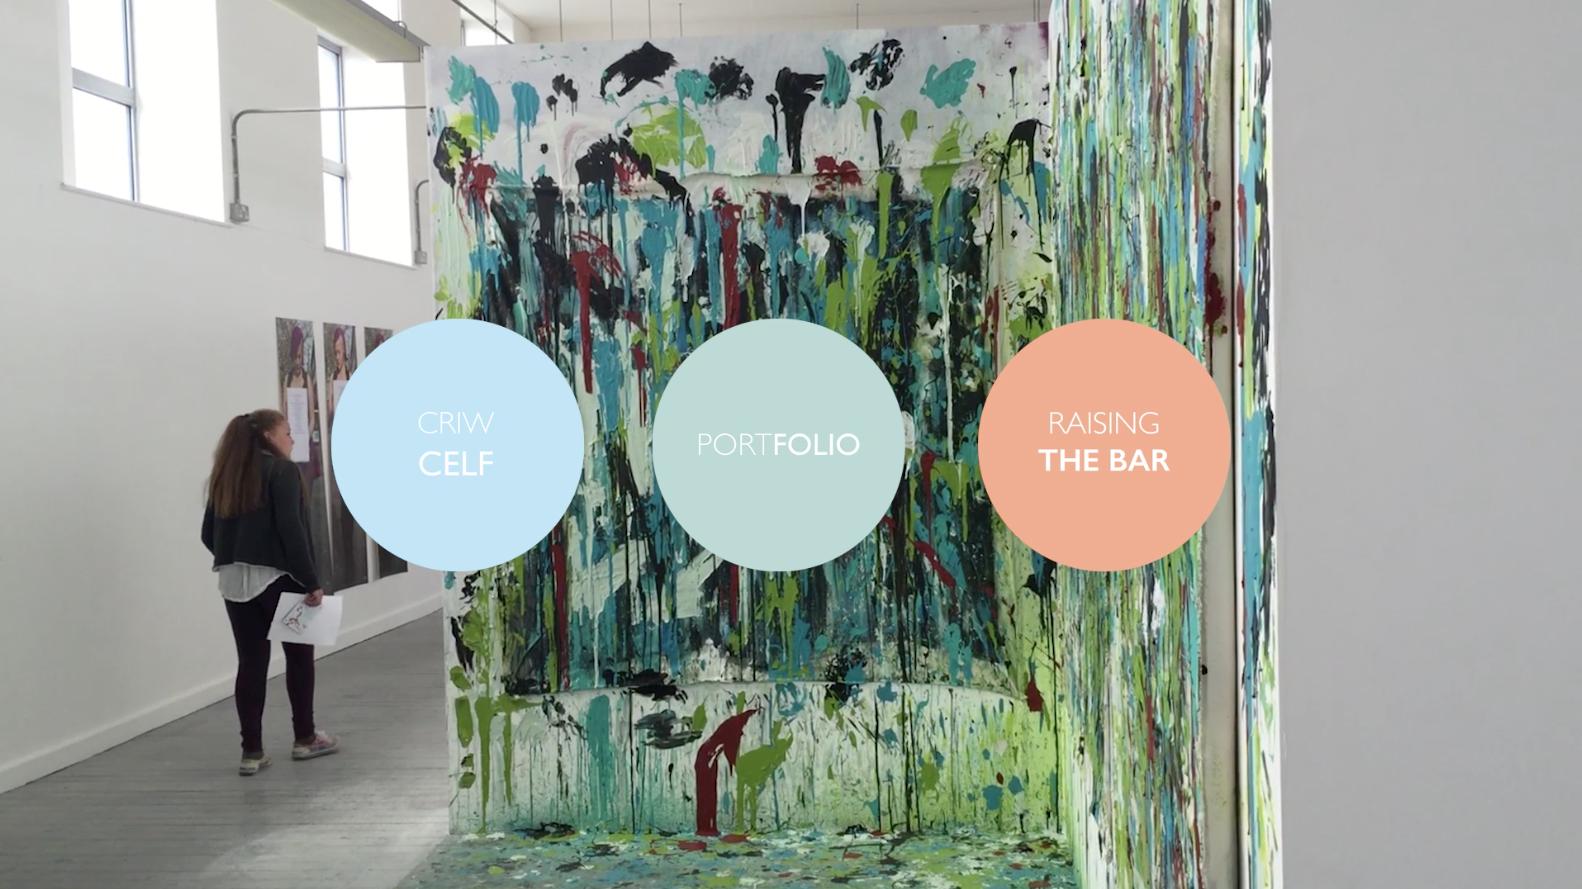 Criw Celf West visit Swansea College of Art Degree Exhibitions